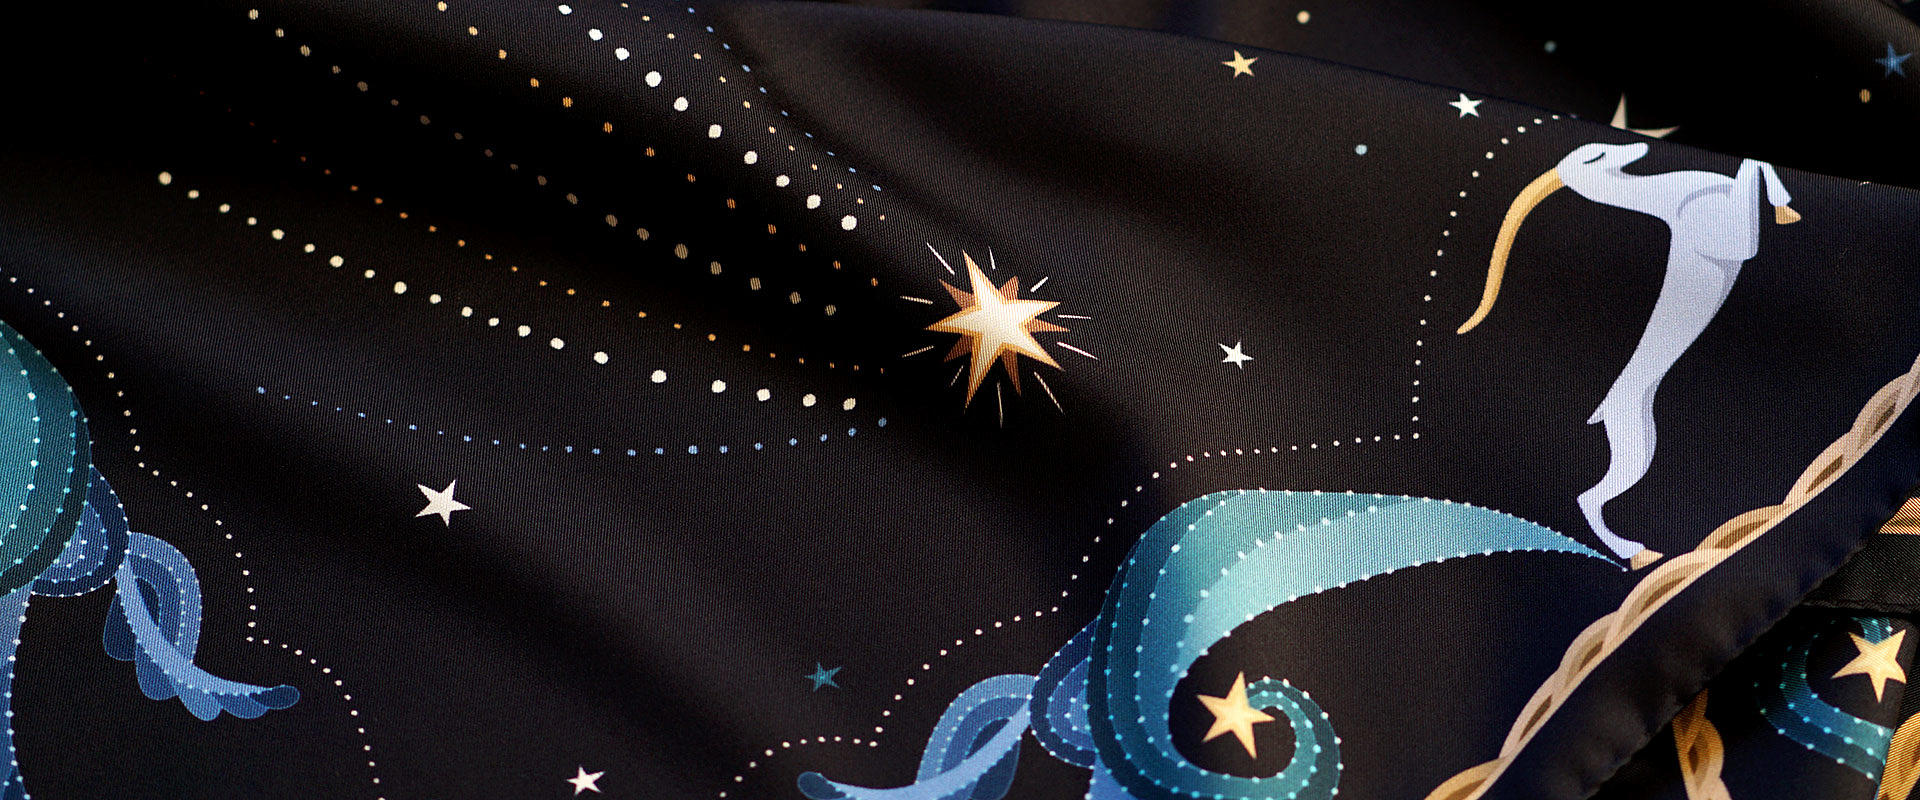 LE-CHALE-BLEU-silk-twill-scarves-moon-black-home